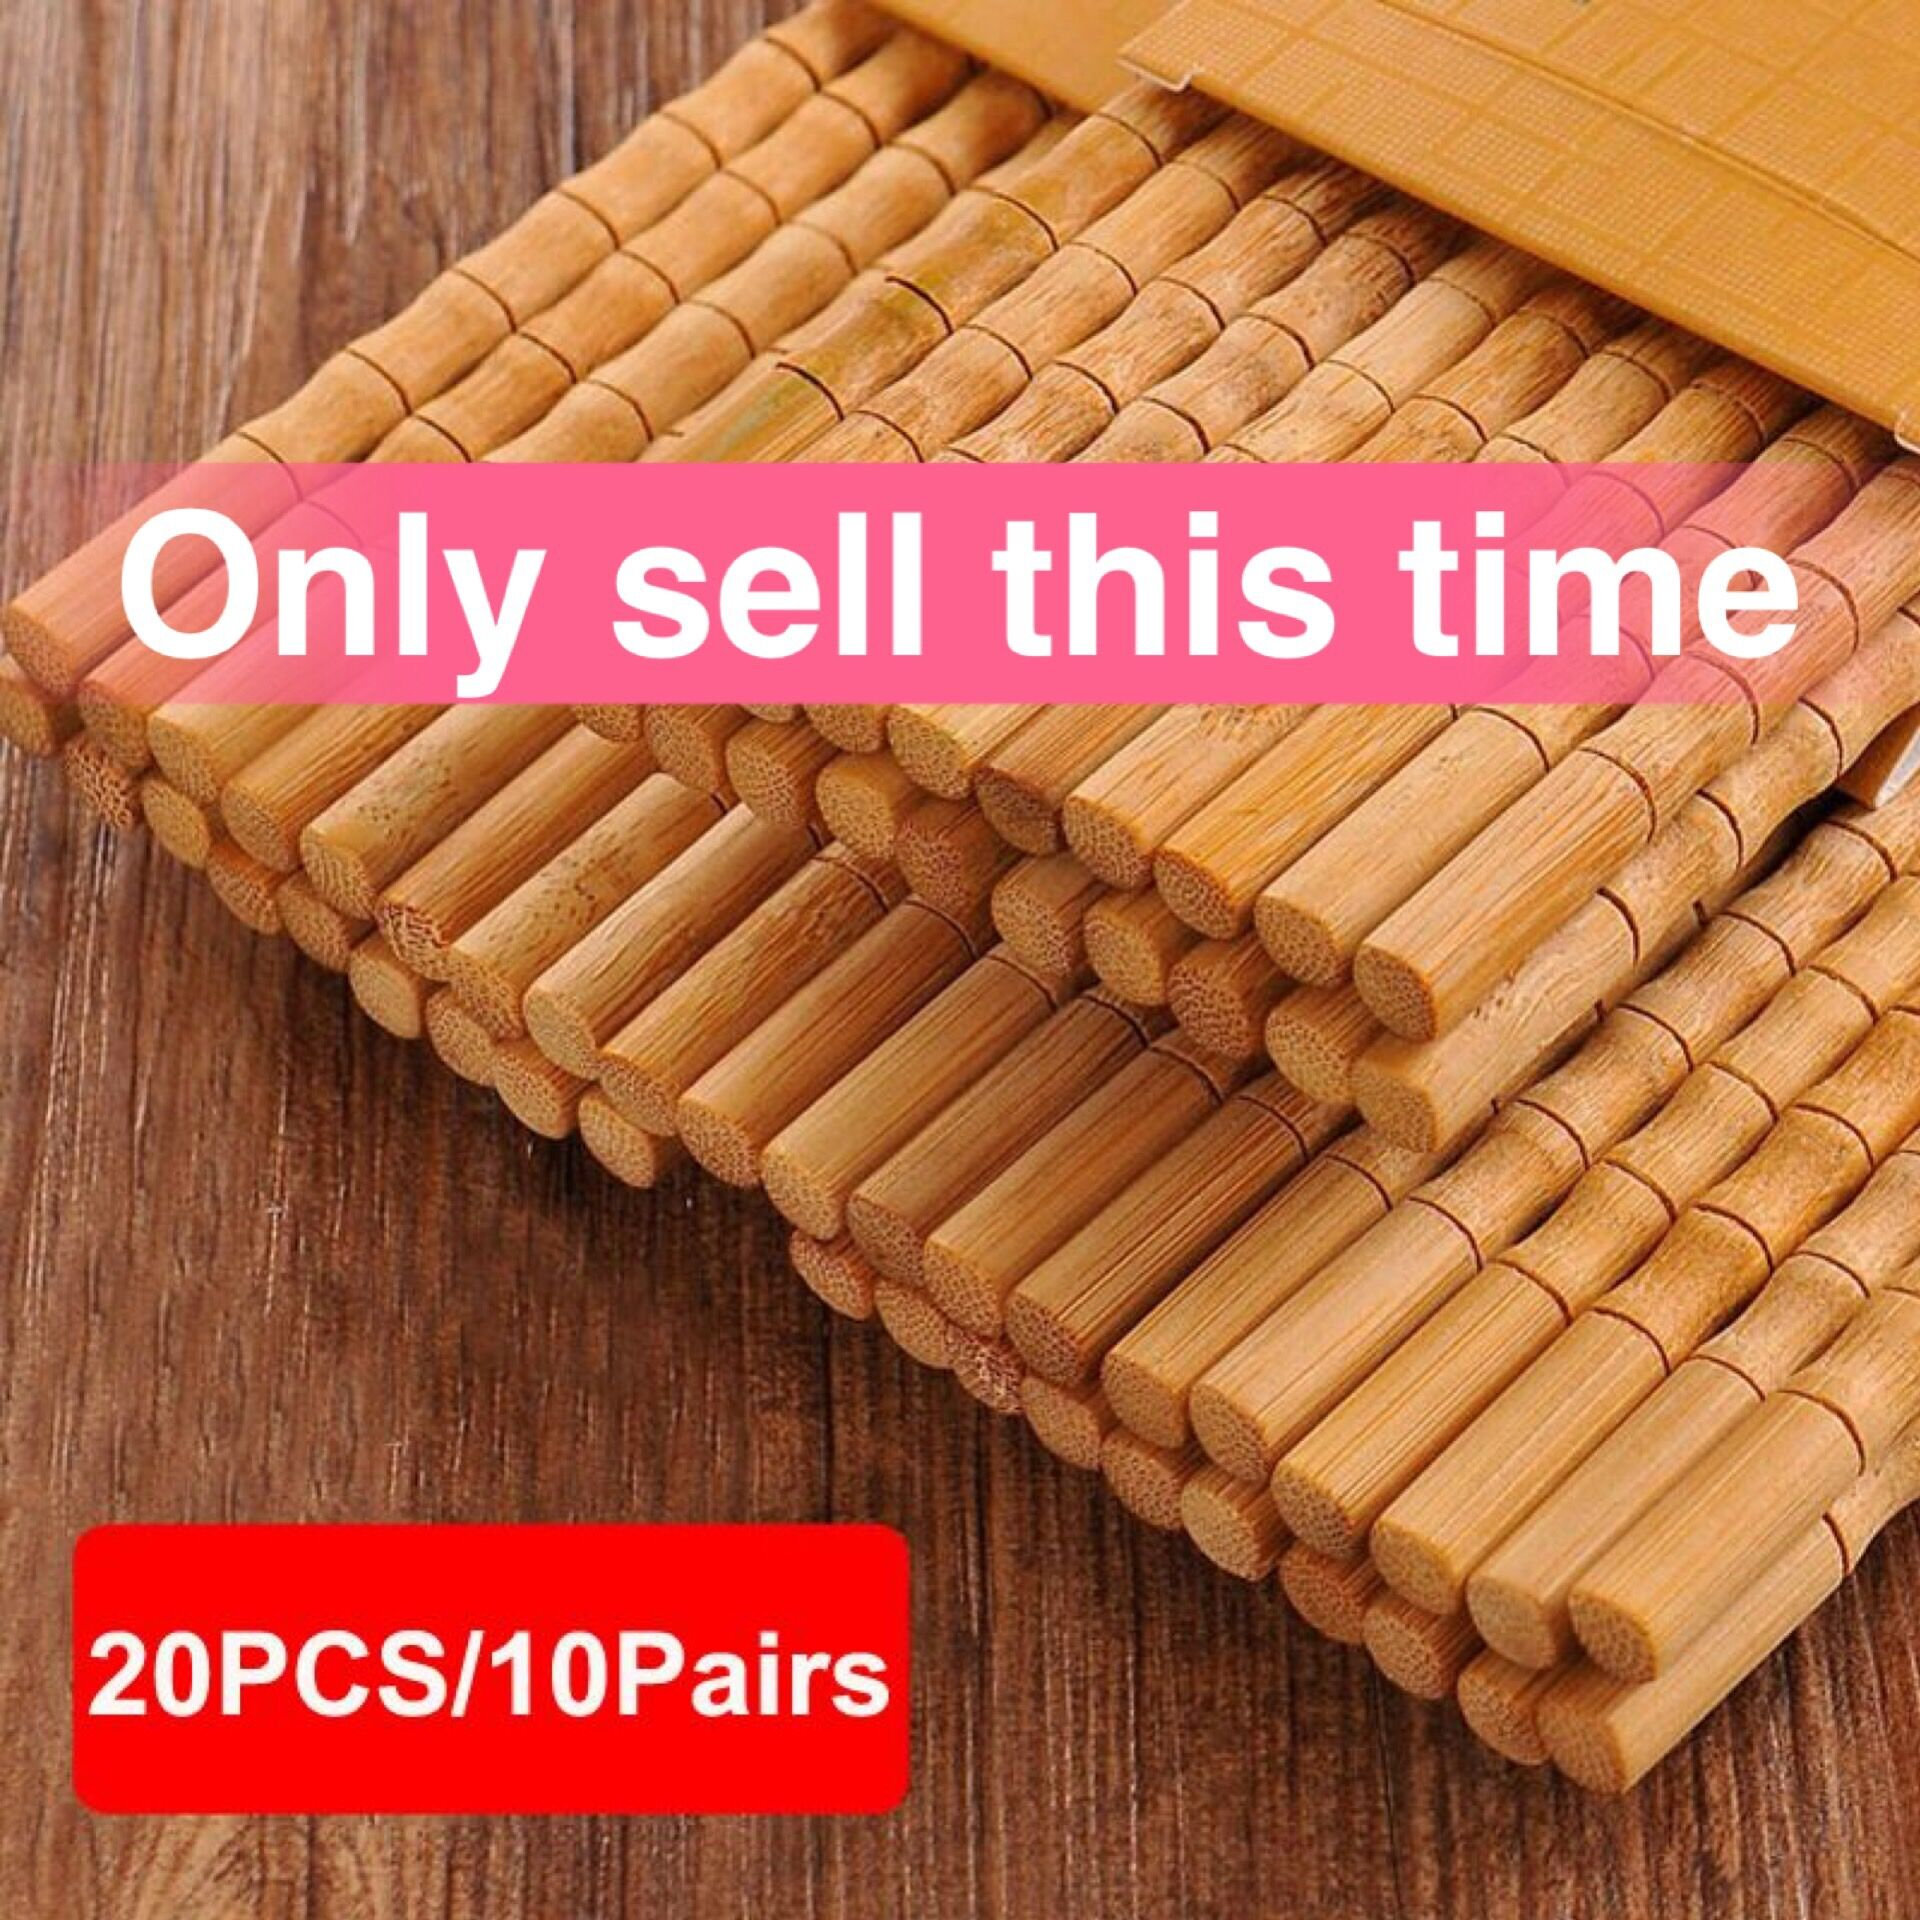 20PCS Kitchen Mildew Chopsticks Nanzhu Household Solid Wood Mildew High Temperature Bamboo Non slip Family Pack Chinese NoPaint Chopsticks     - title=